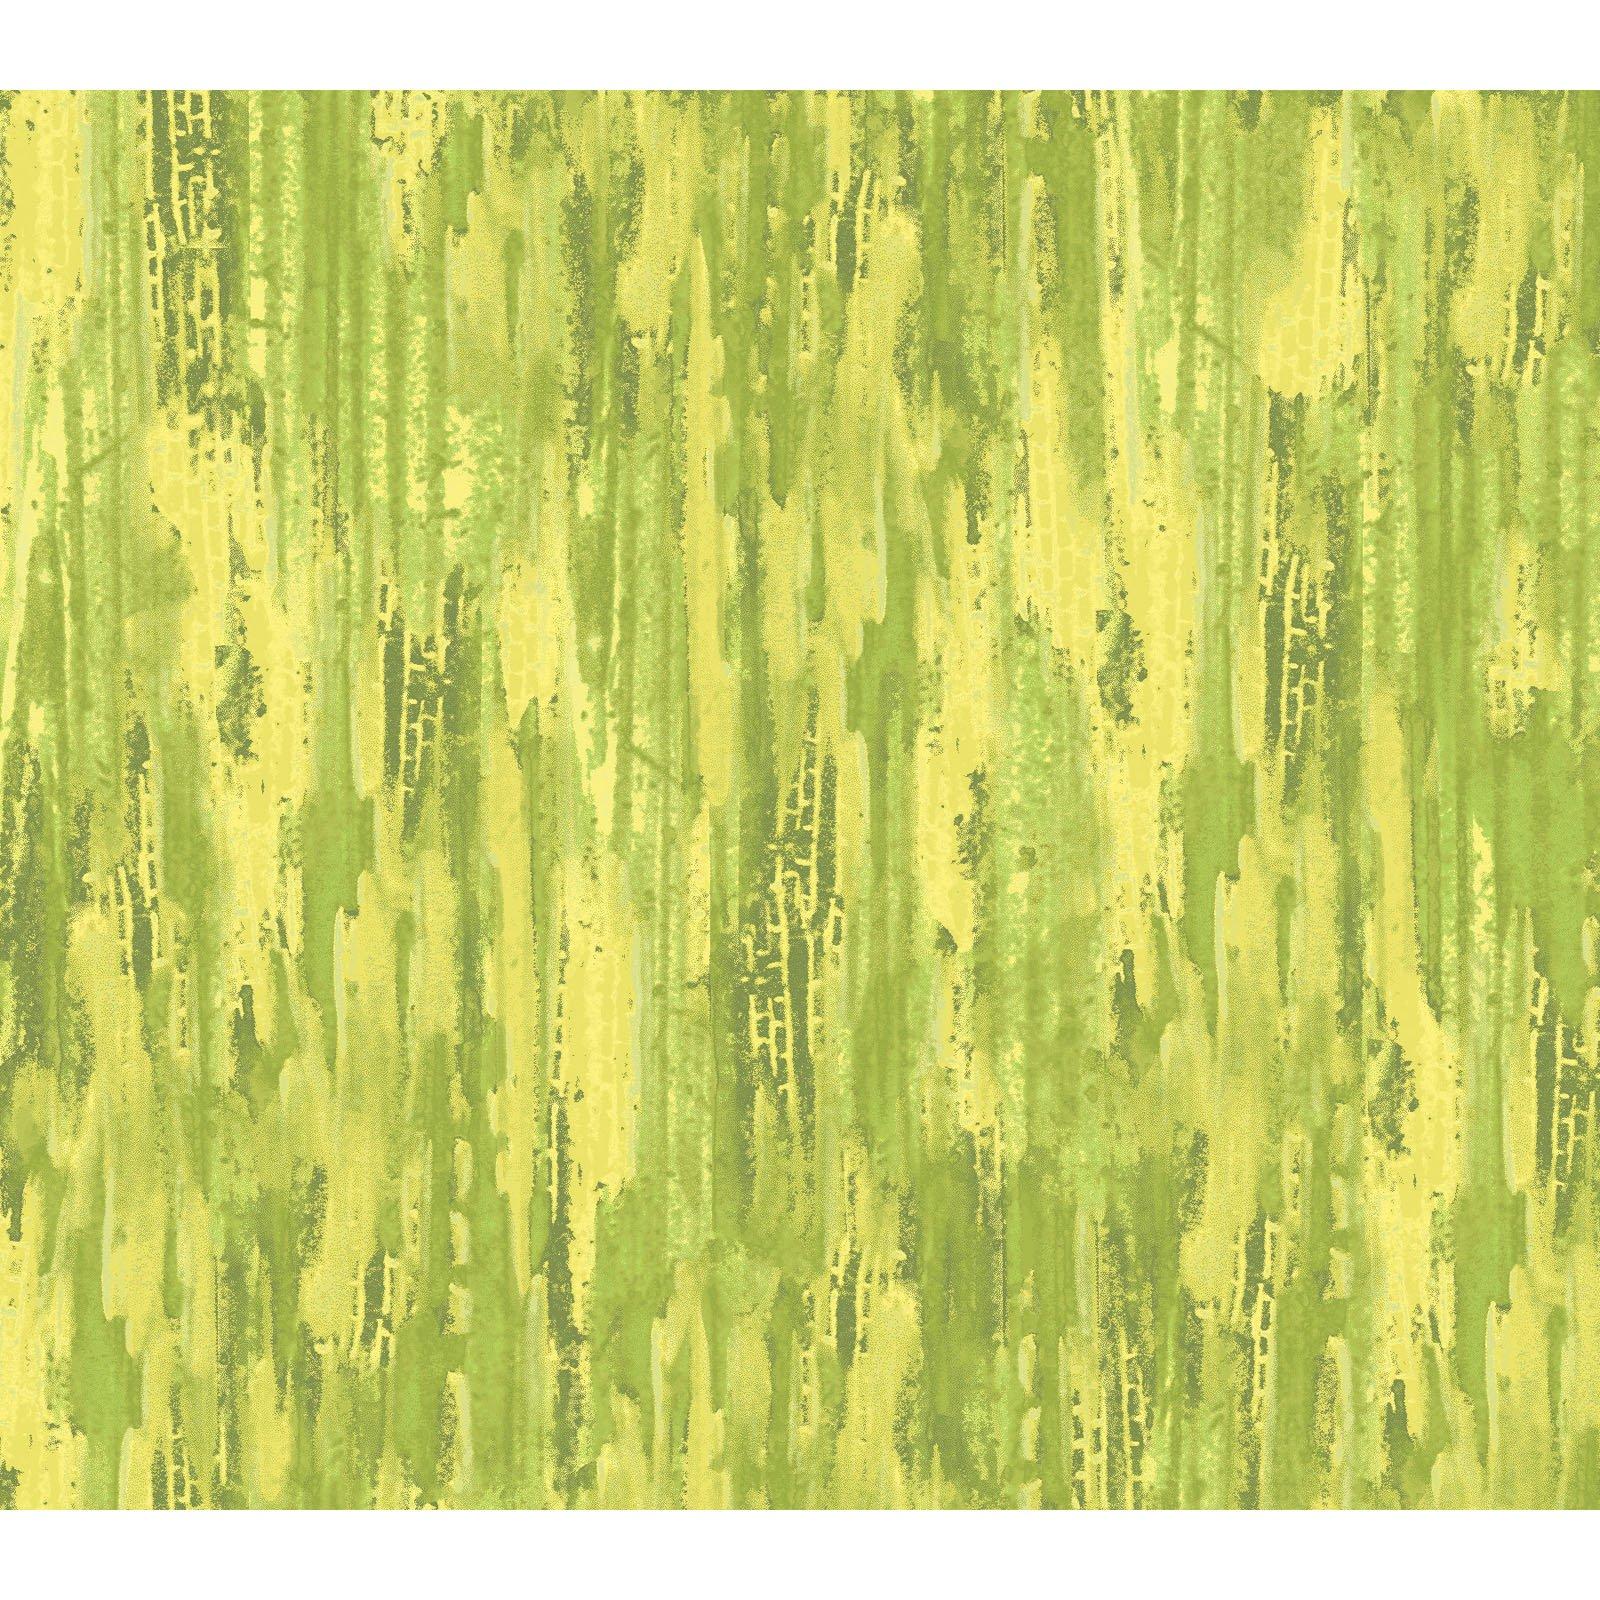 Adalee's Garden - Wood Green<br/>Red Rooster 902-GRE1